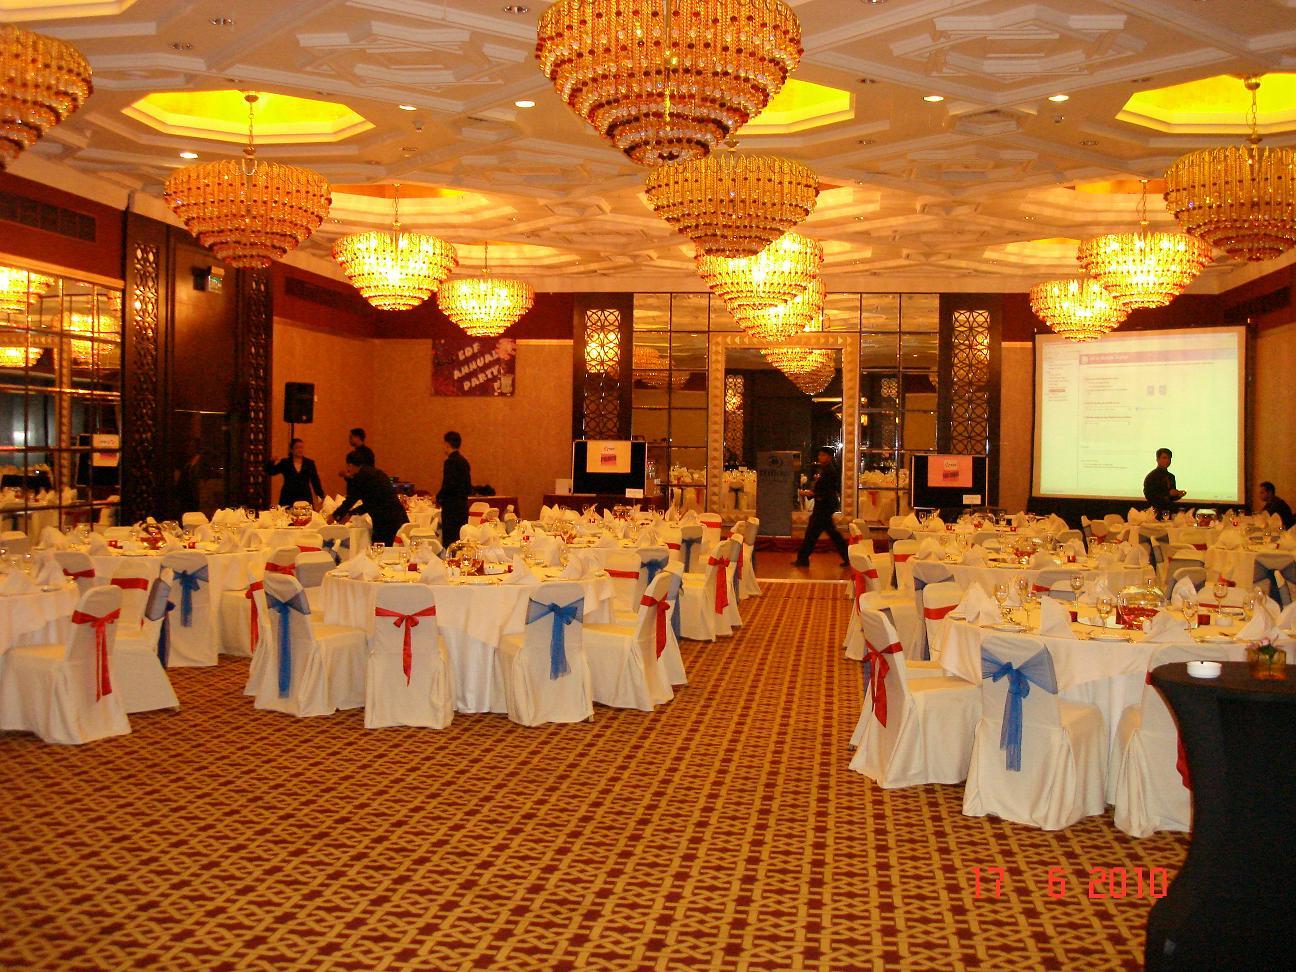 salle de mariage avec d 233 coration marocaine d 233 co salon marocain